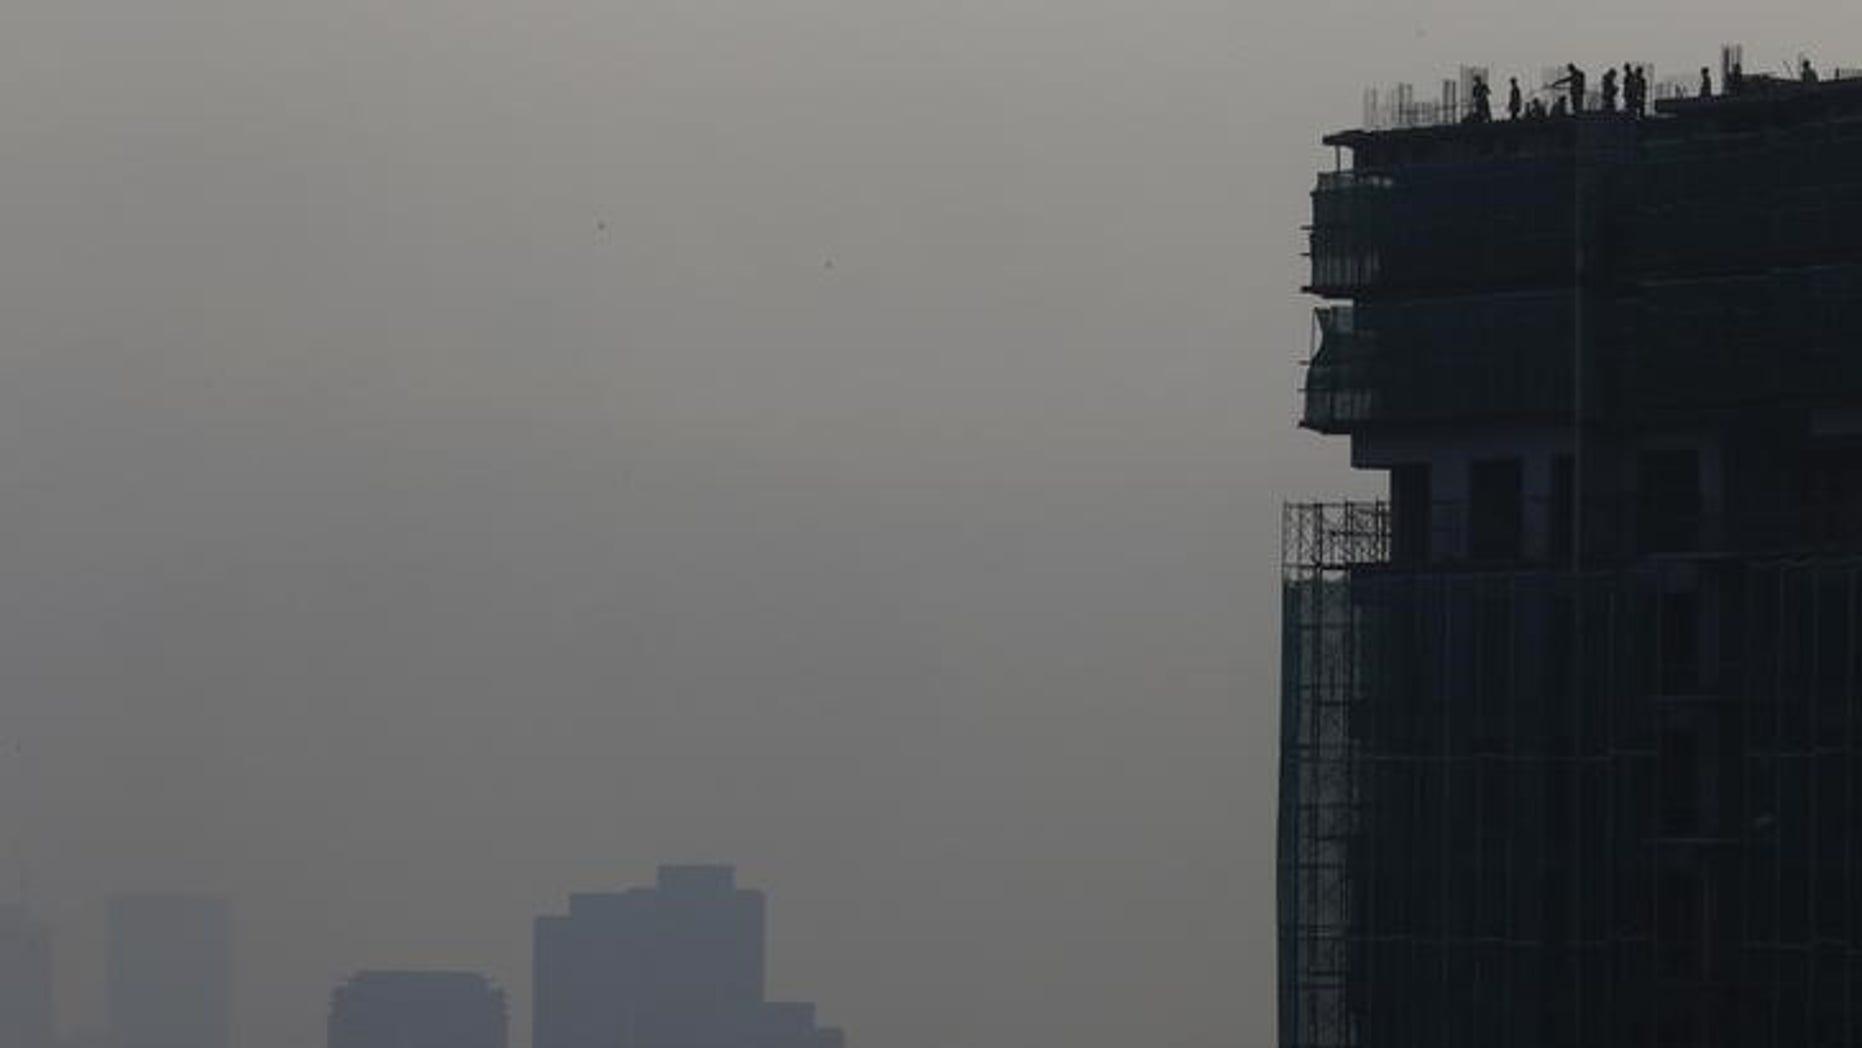 Builders work on hazy day in Kuala Lumpur, Malaysia, October 8, 2015. REUTERS/Olivia Harris